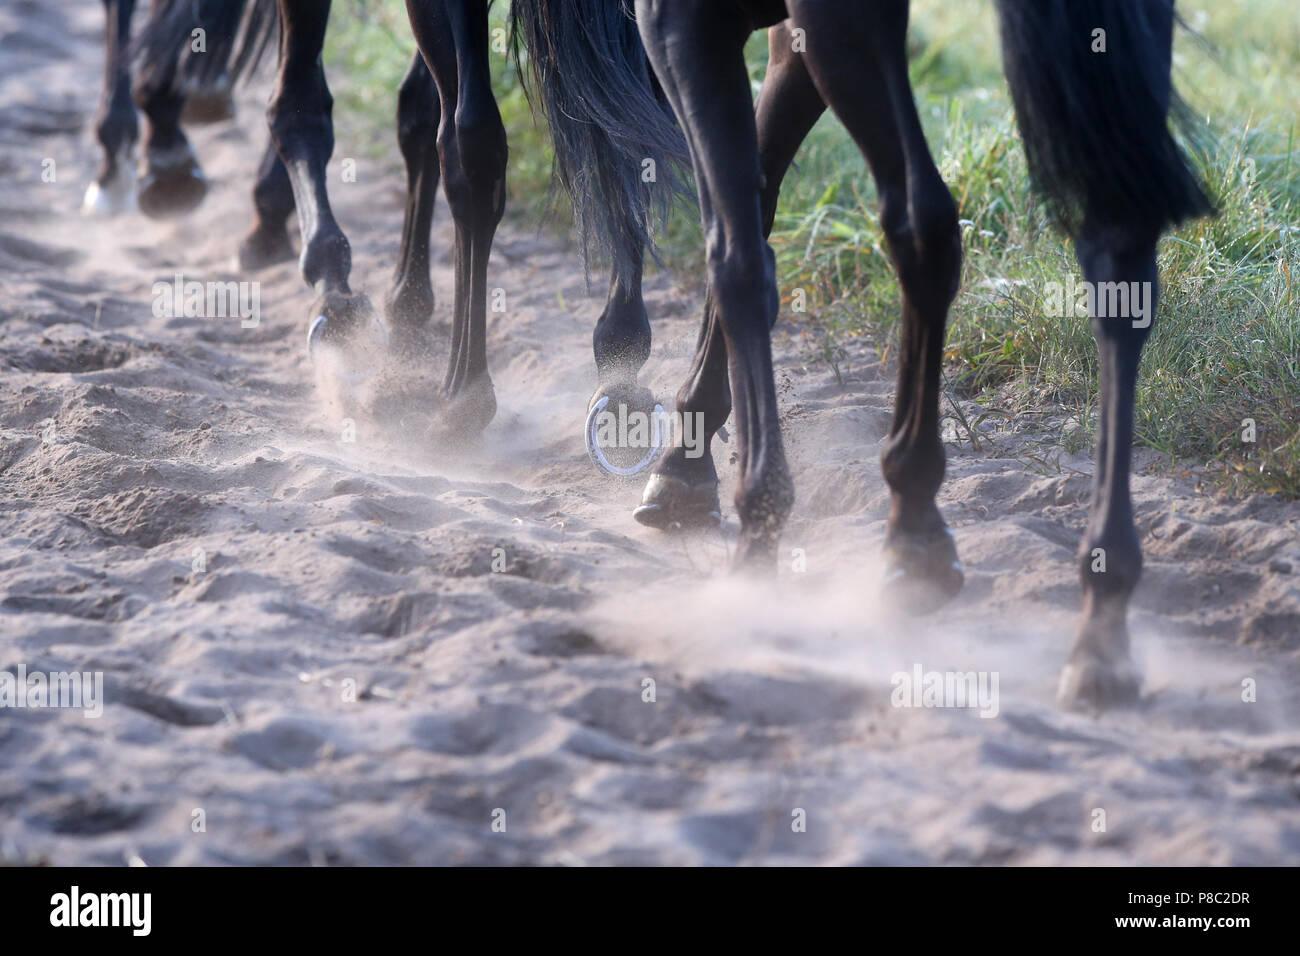 Neuenhagen, Alemania, patas de caballo al trote sobre suelo arenoso Imagen De Stock